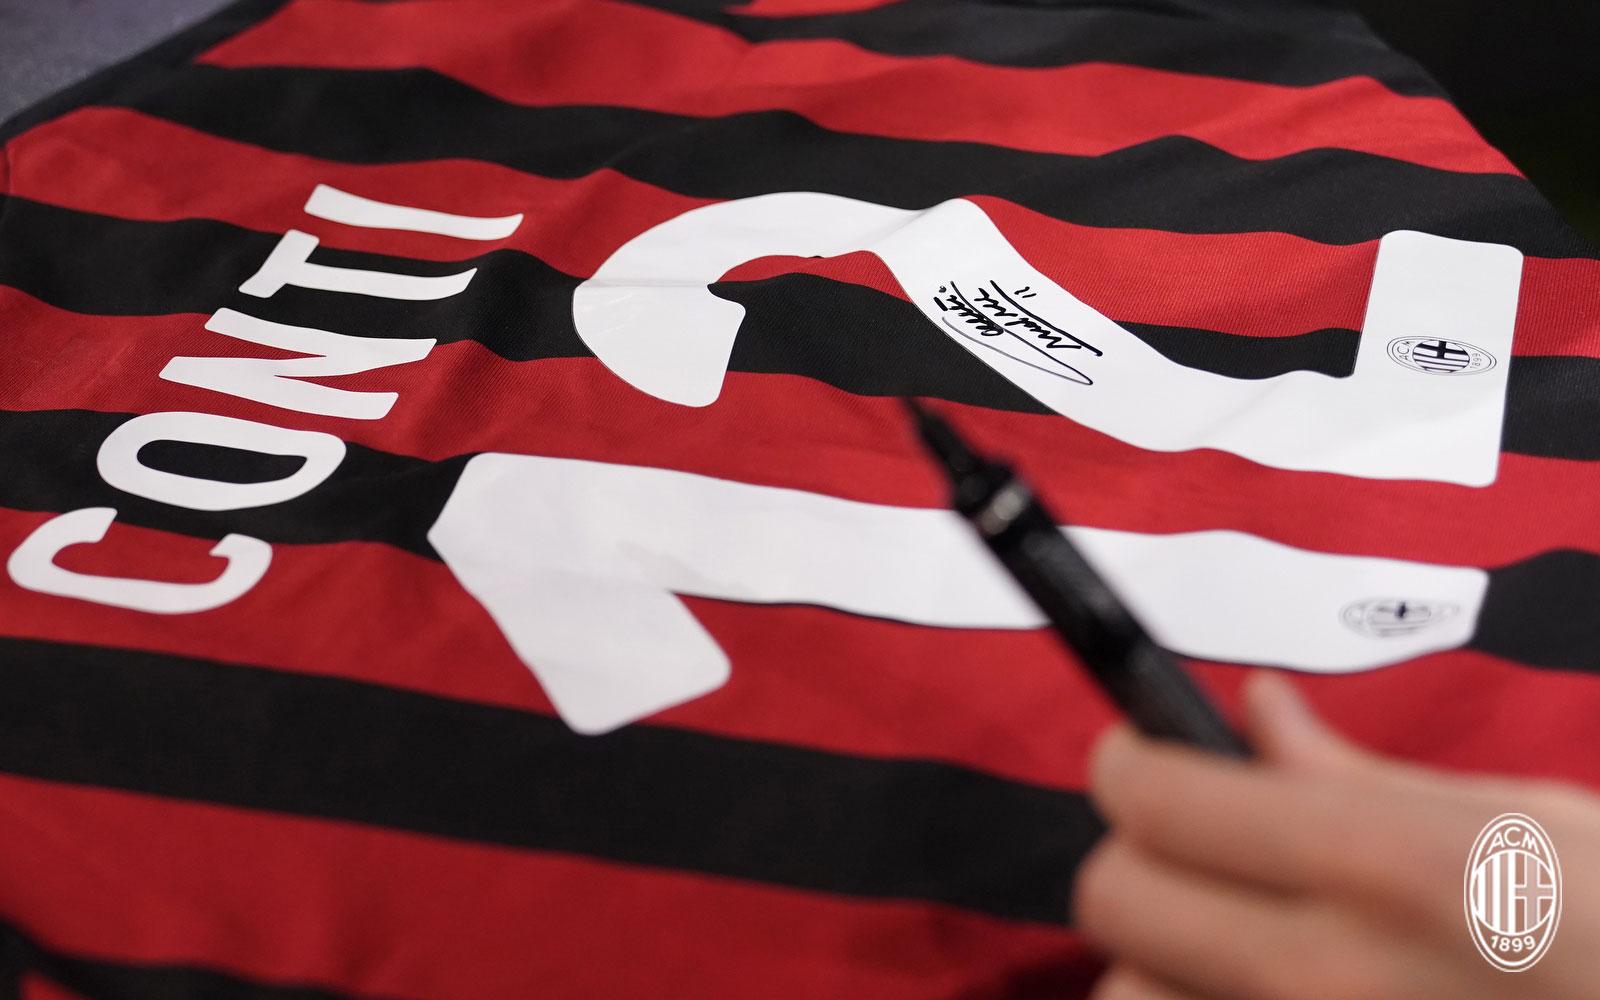 Andrea Conti's signed #12 jersey. (@acmilan.com)